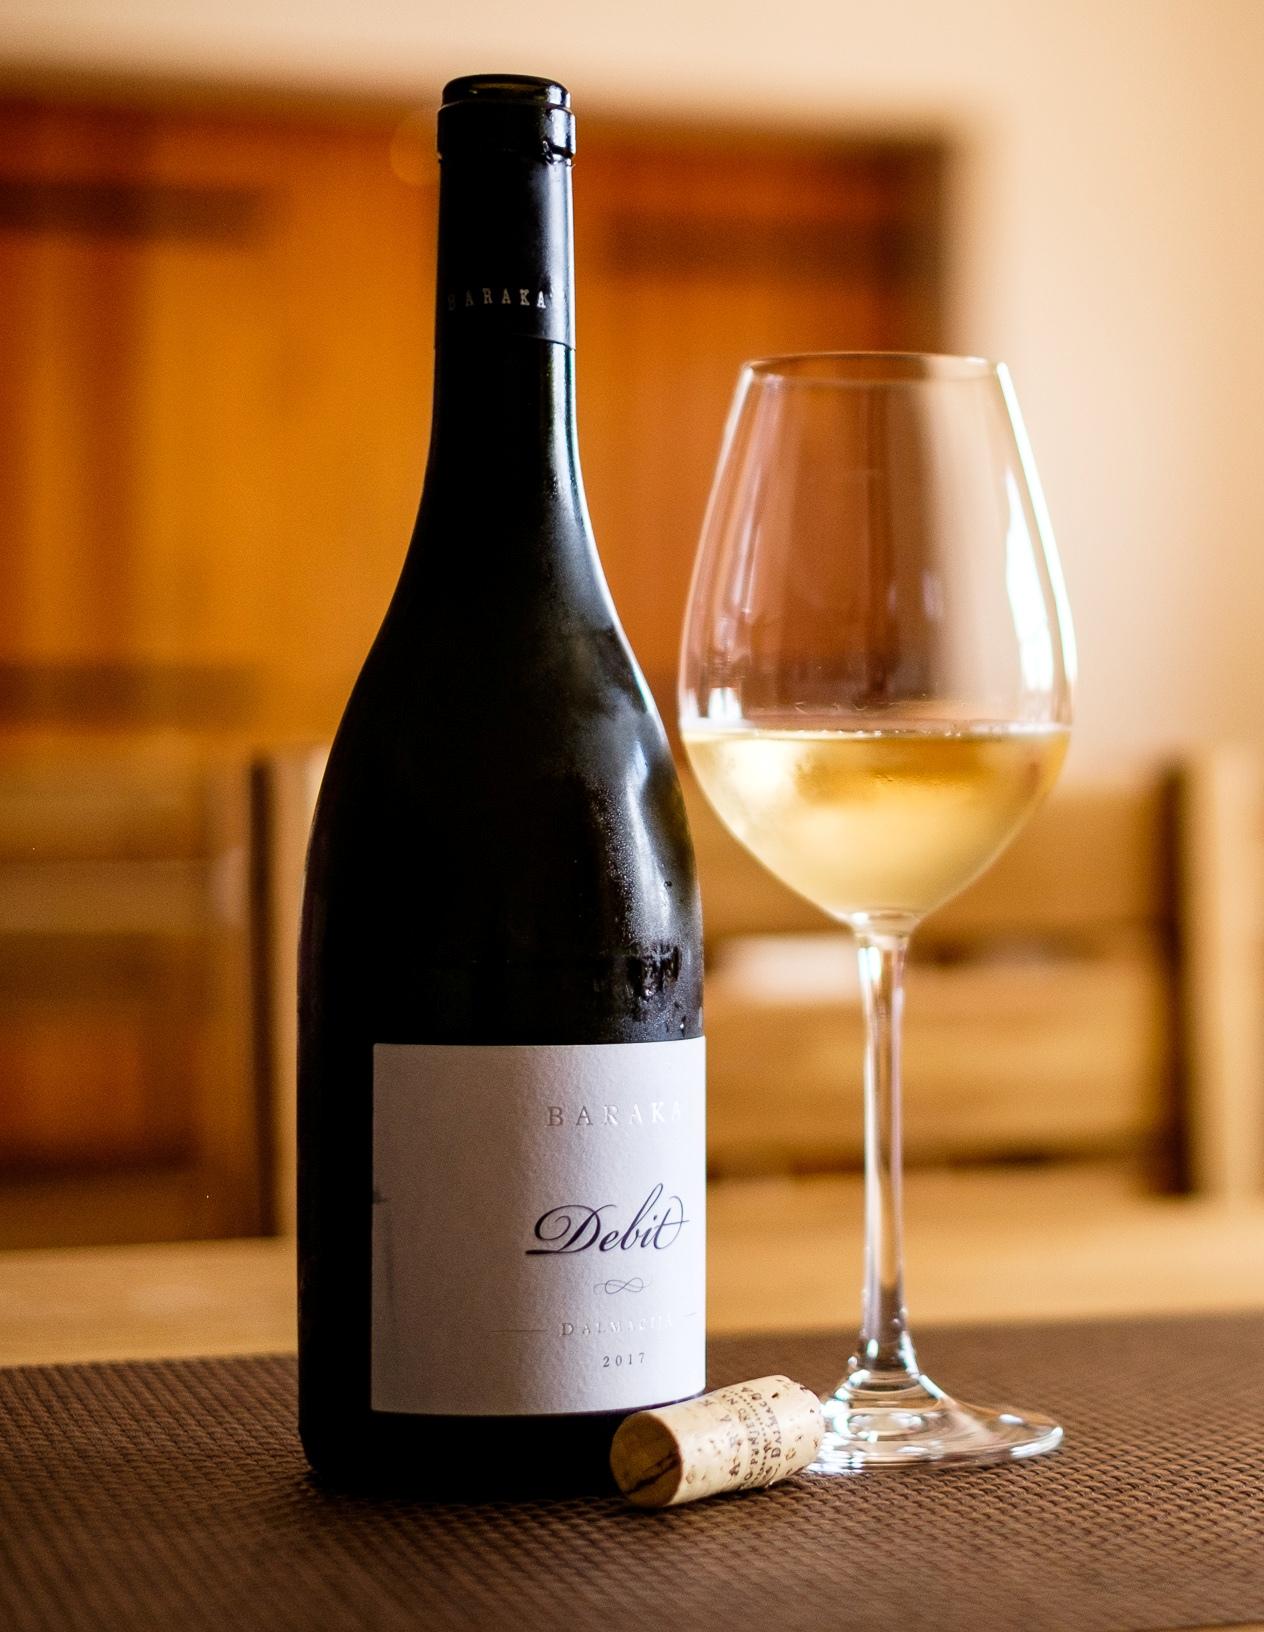 Baraka's Debit Wine